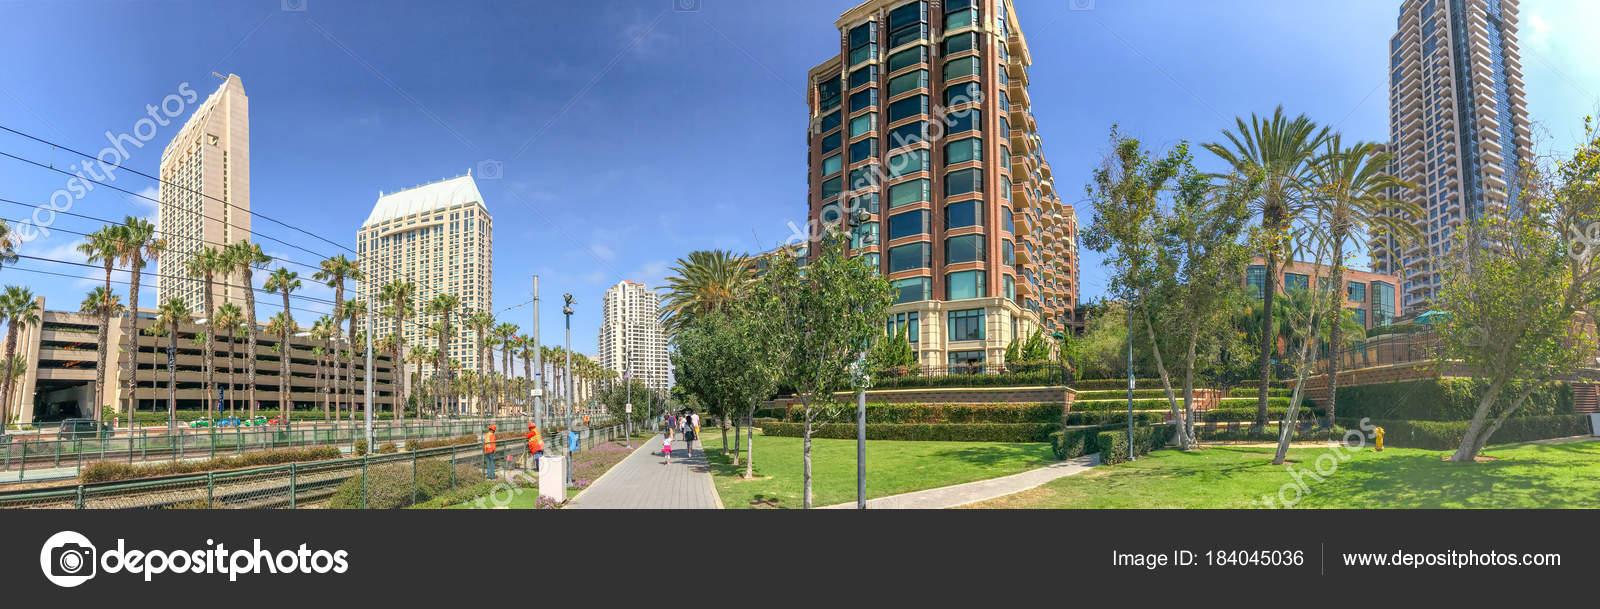 San Diego July 2017 City Skyline Martin Luther King Promenade